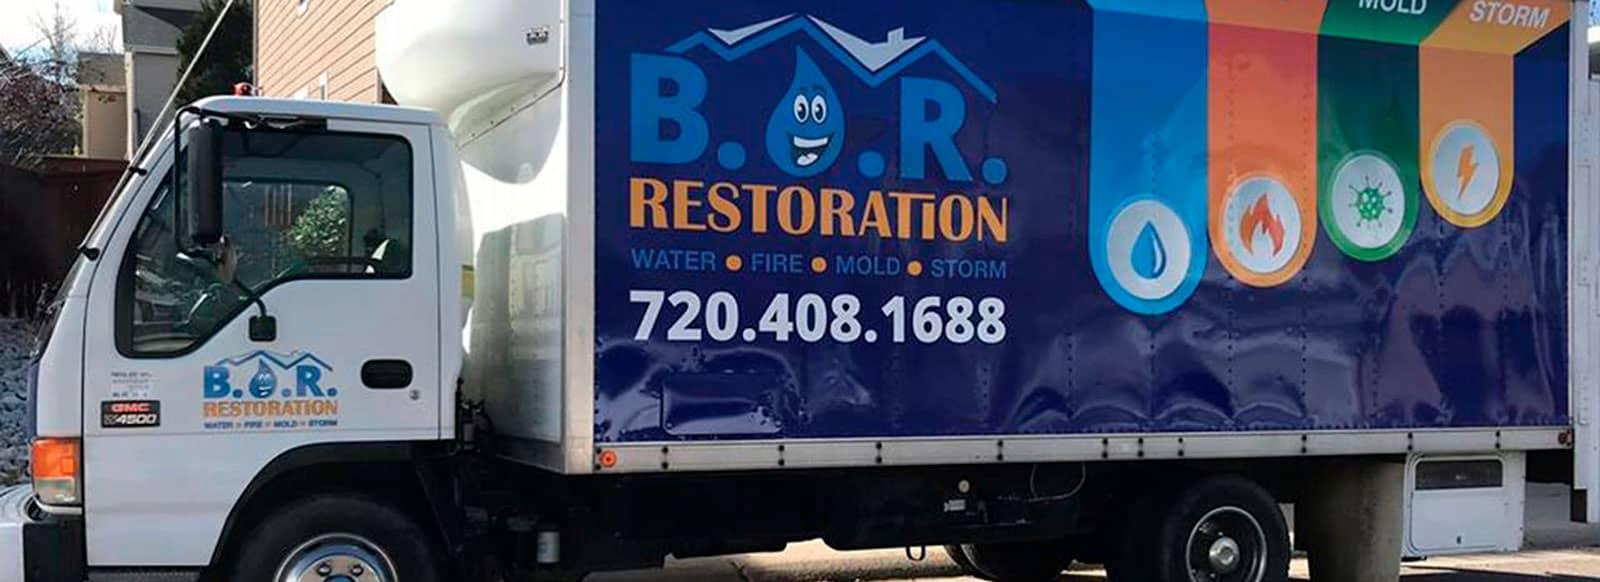 truck-bor-restoration-franchise